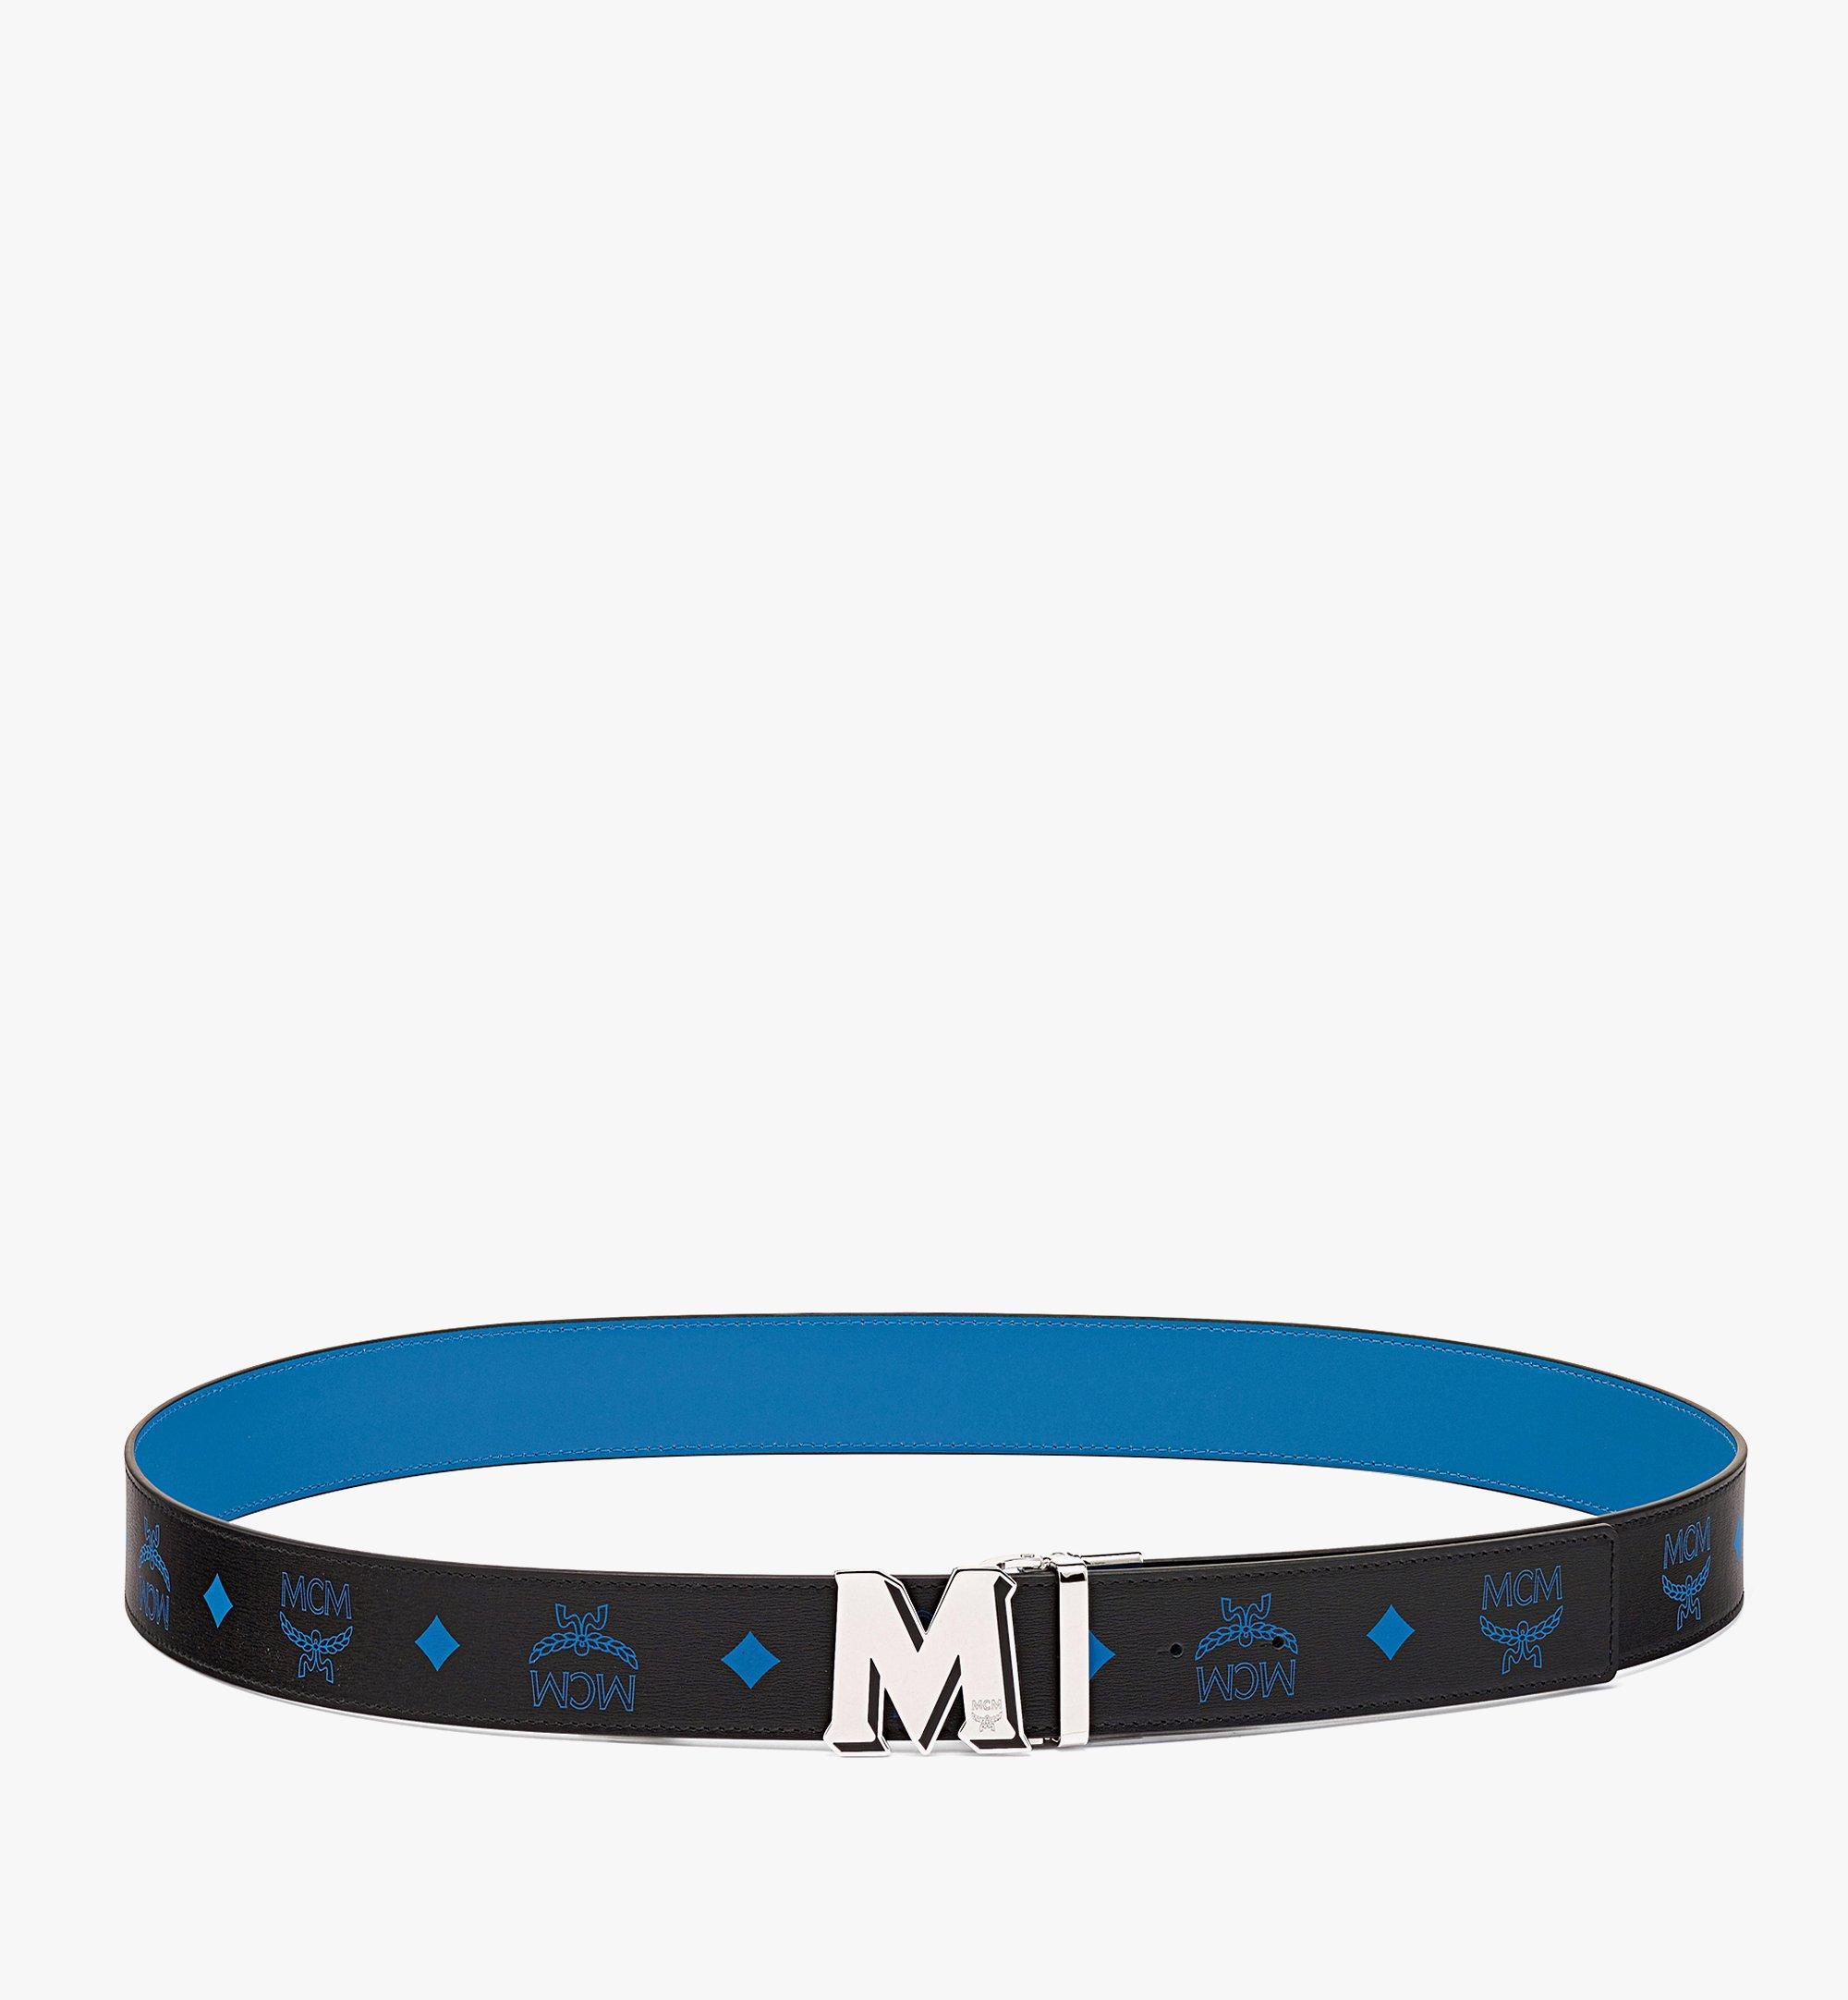 MCM Claus M字压花皮革双面腰带 Blue MXBBAVI09H9001 更多视角 2